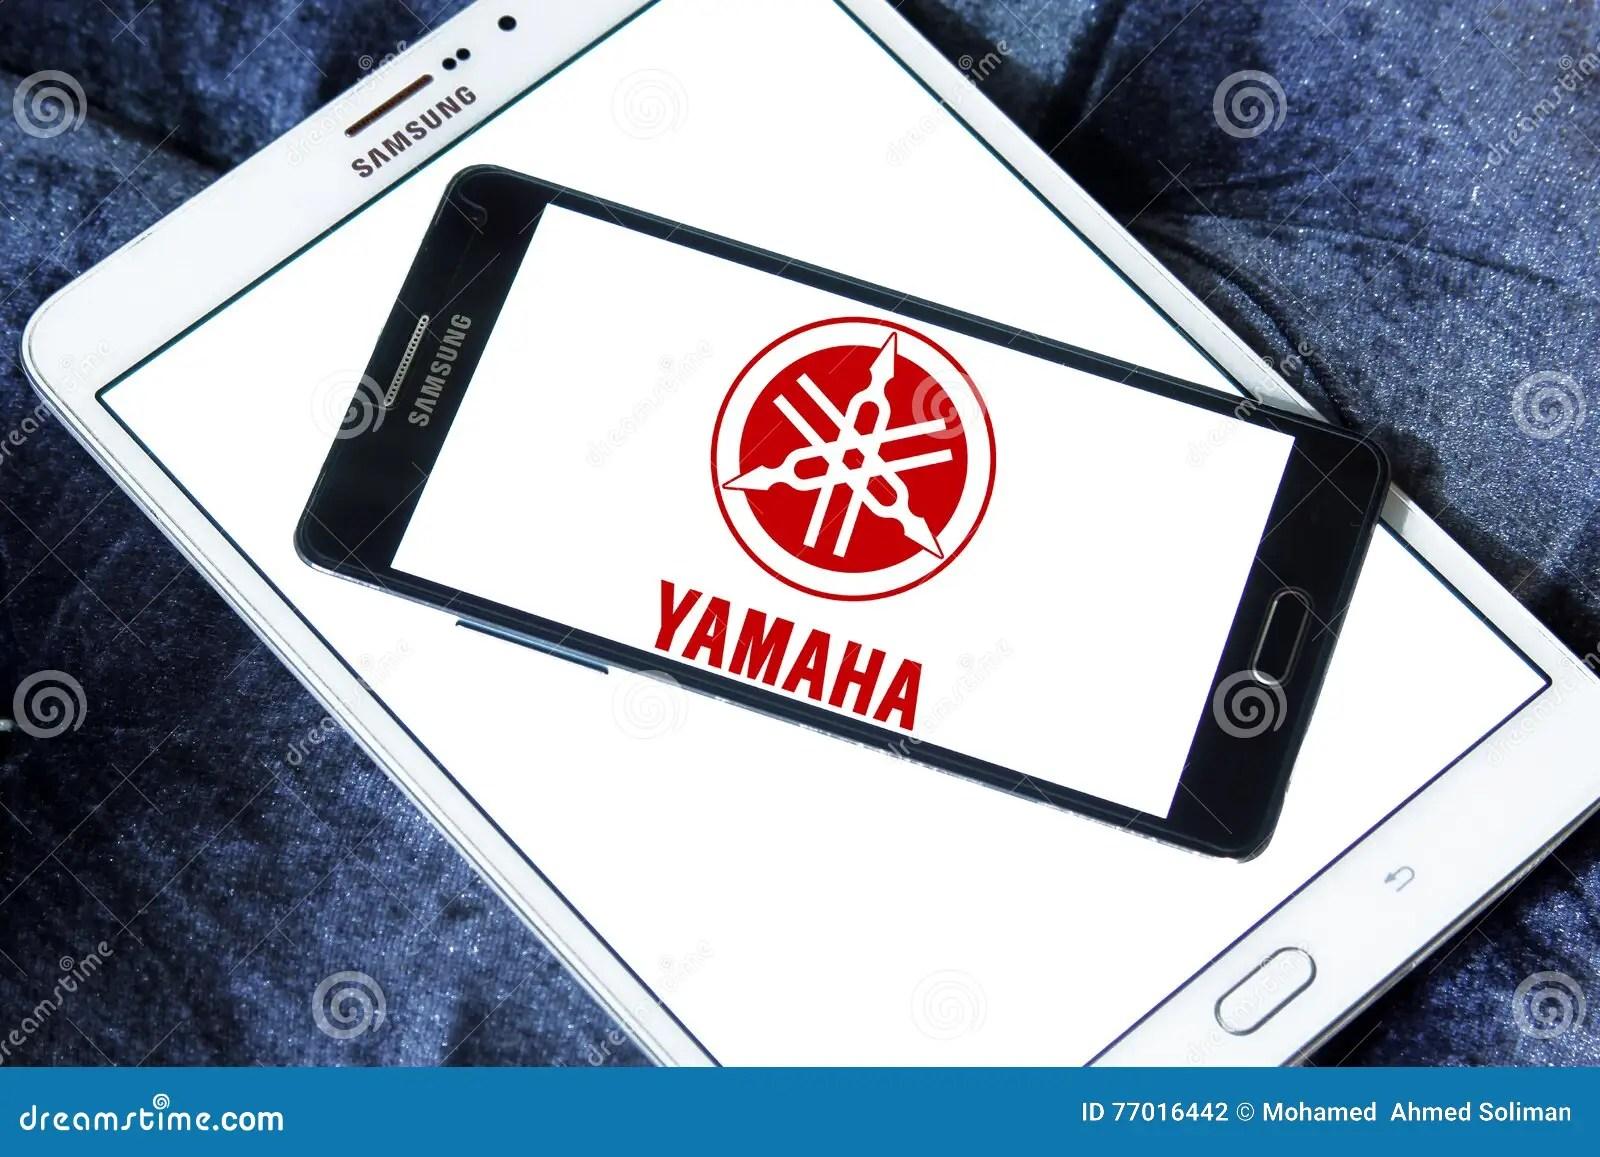 hight resolution of yamaha motor logo